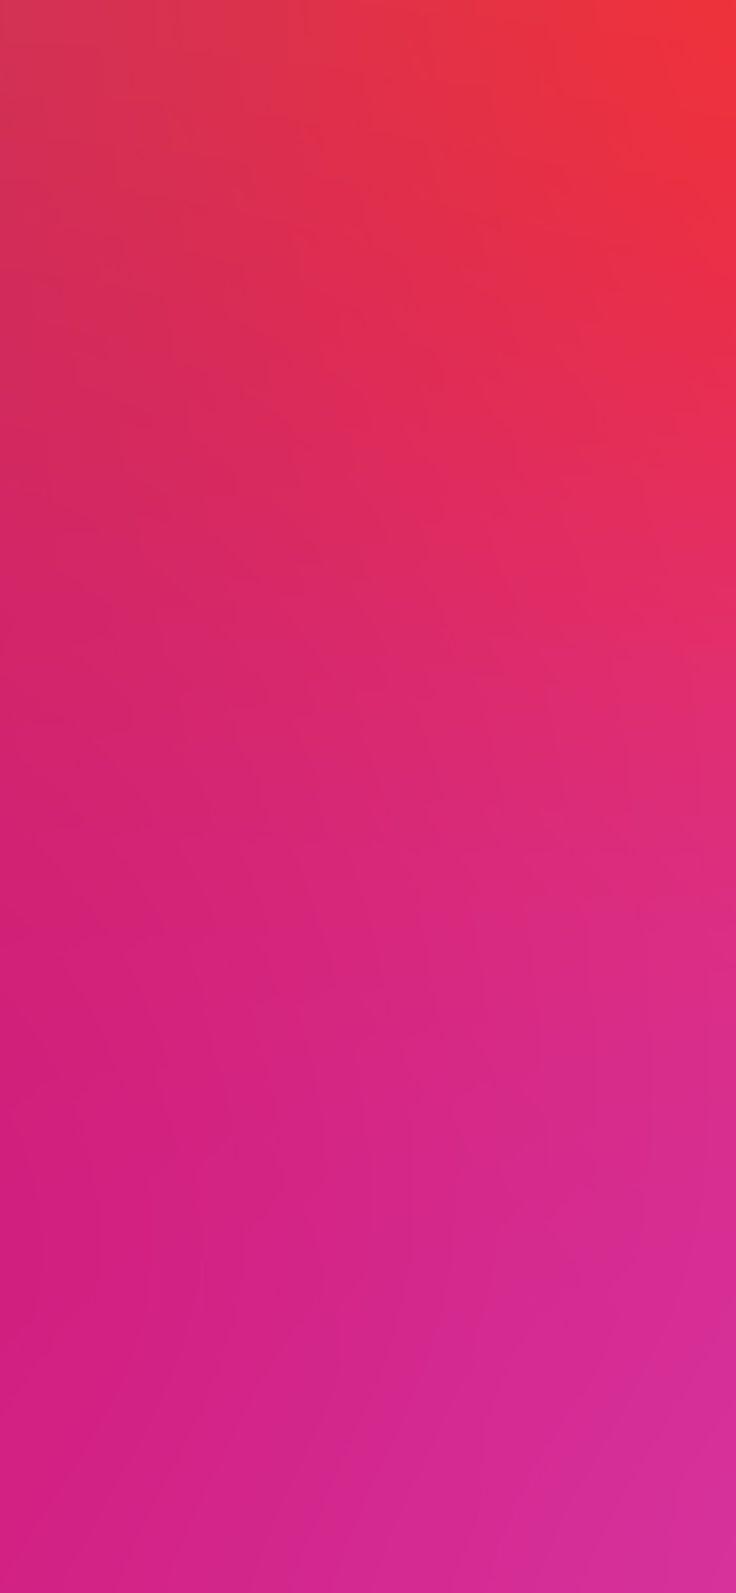 Iphone X Wallpaper Sm90 Hot Pink Red Blur Gradation Via